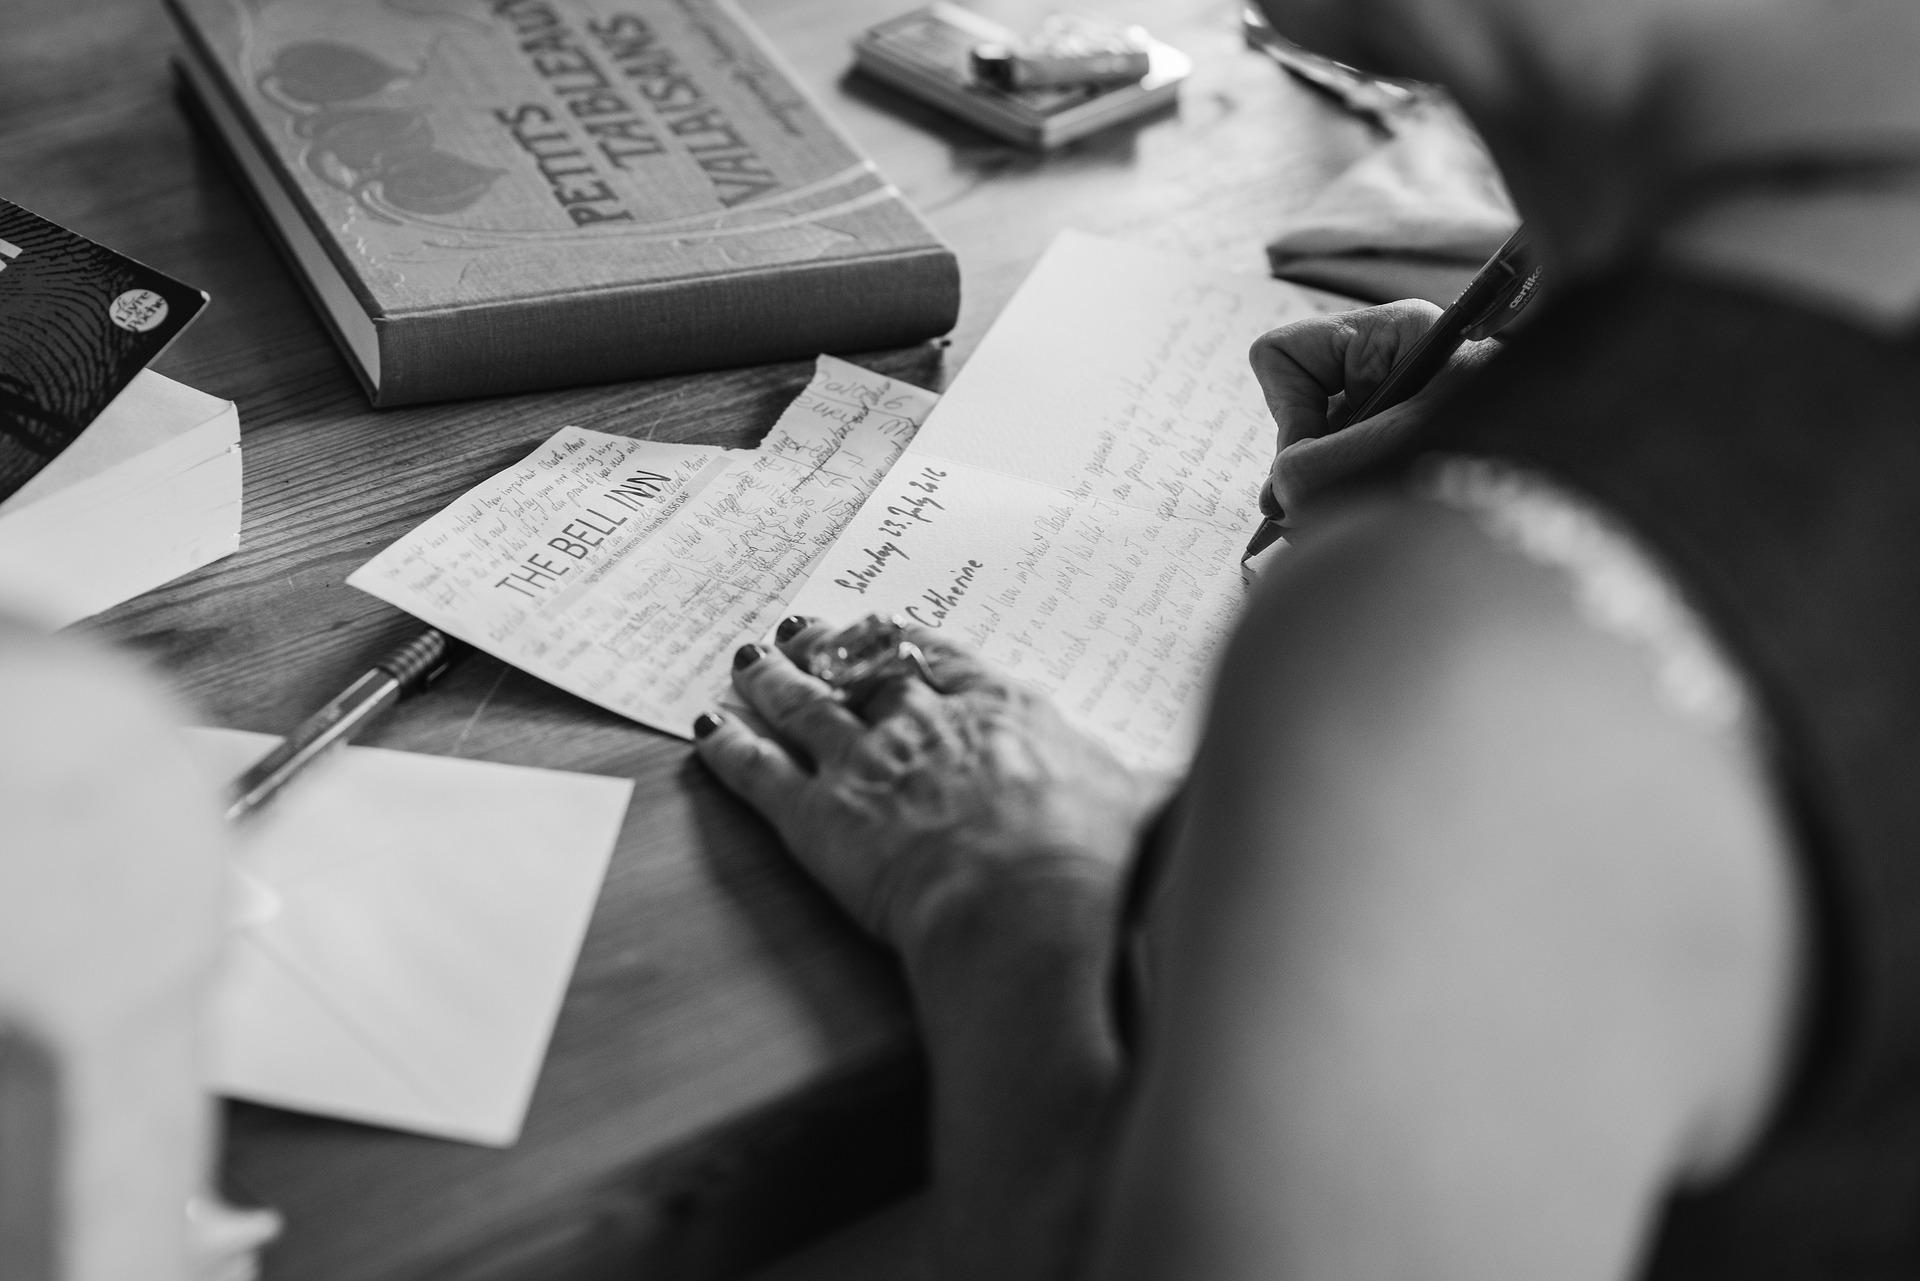 hands-writting-2110452_1920